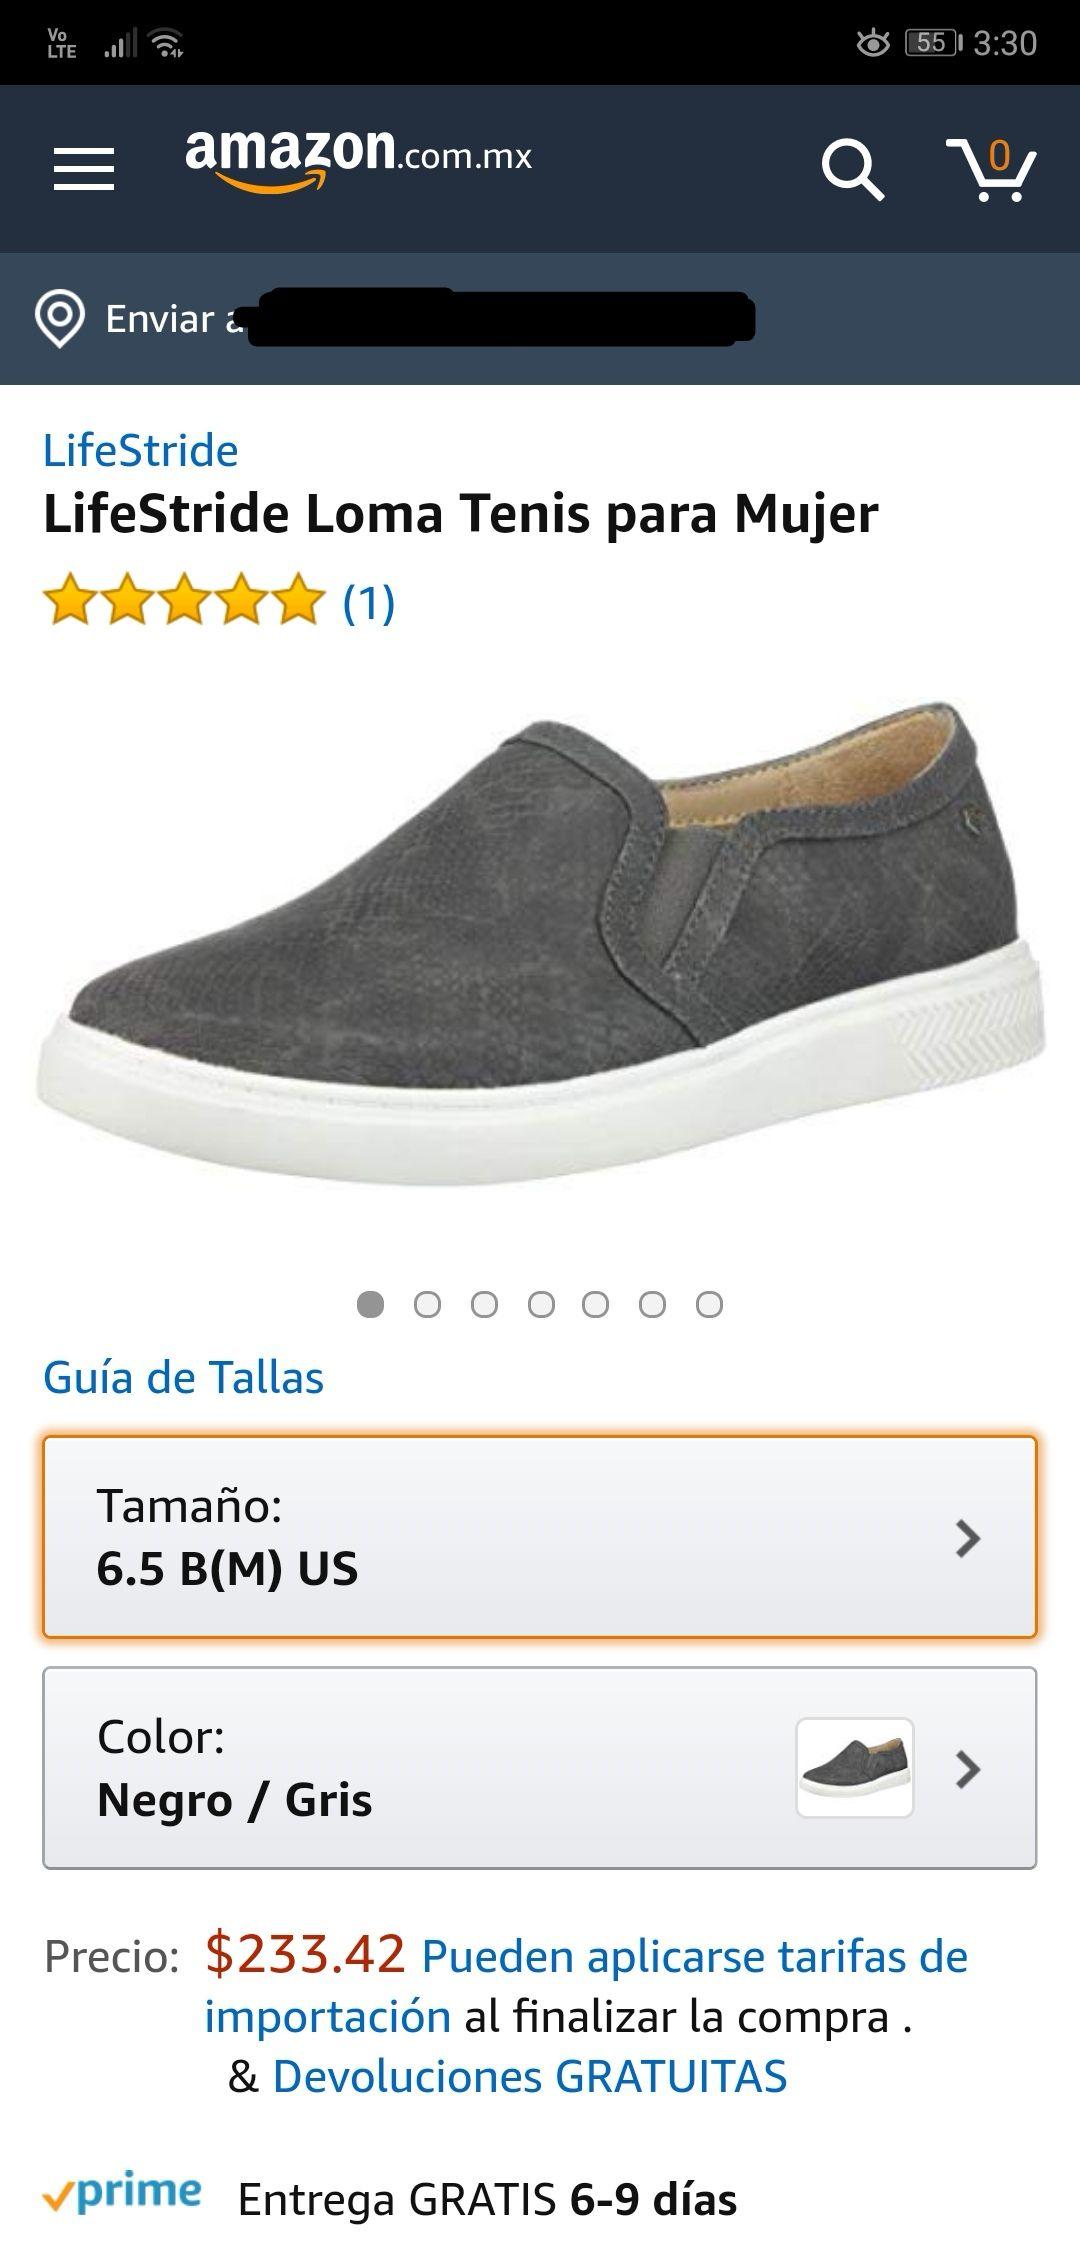 Amazon: LifeStride Zapato para Mujer (6.5 USA)